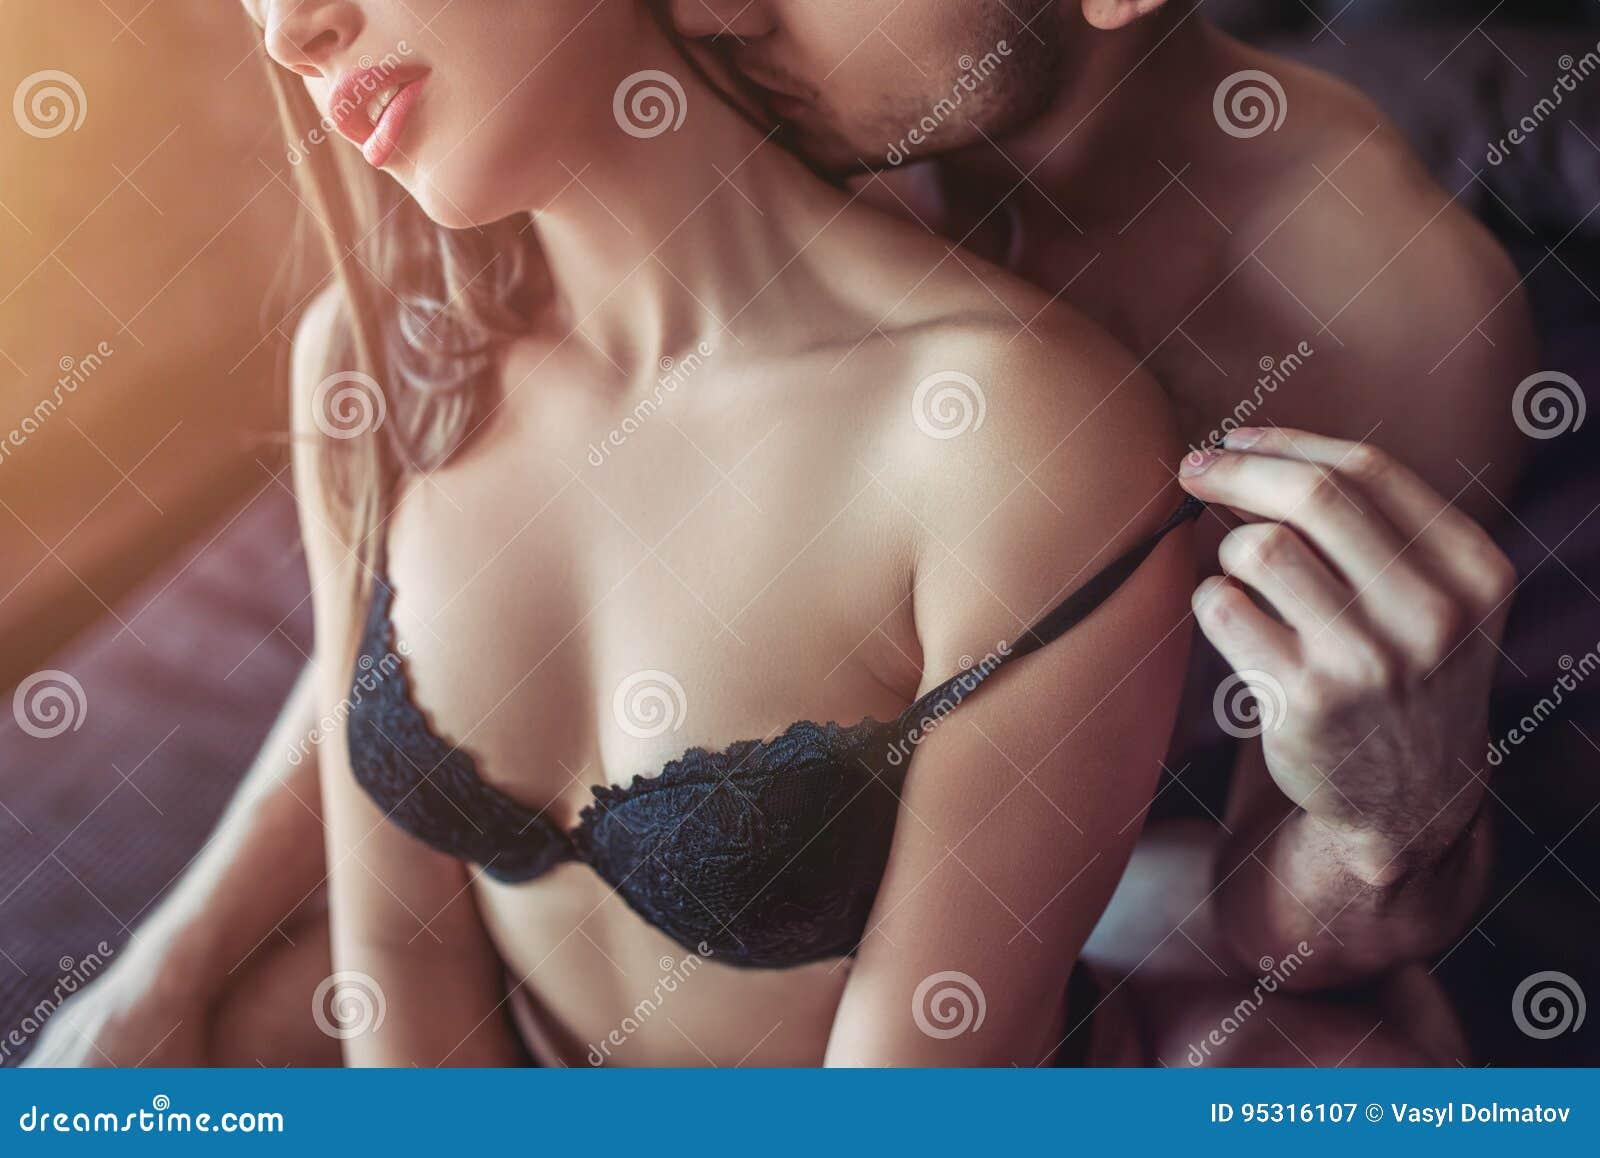 He fucks her deep from behind